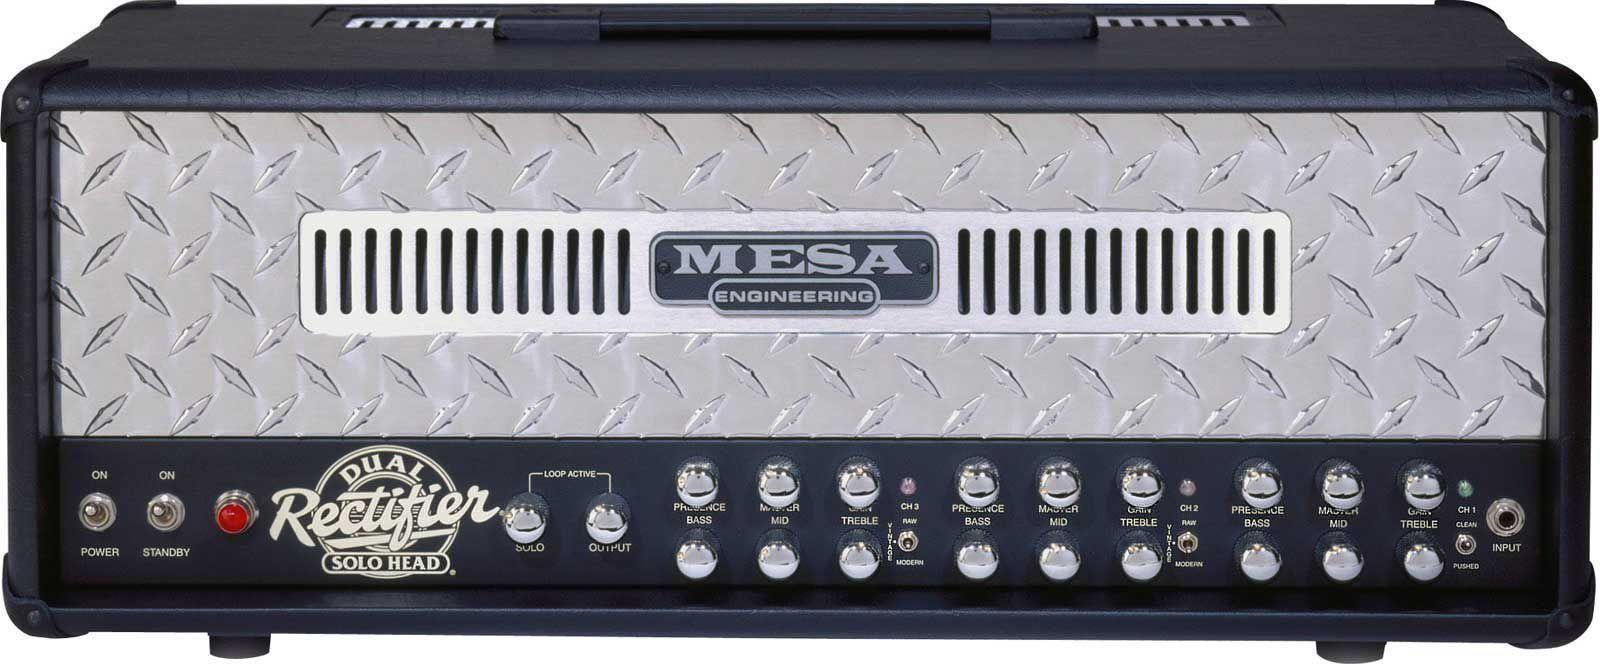 Mesa Boogie - Dual Rectifier - Solo Head